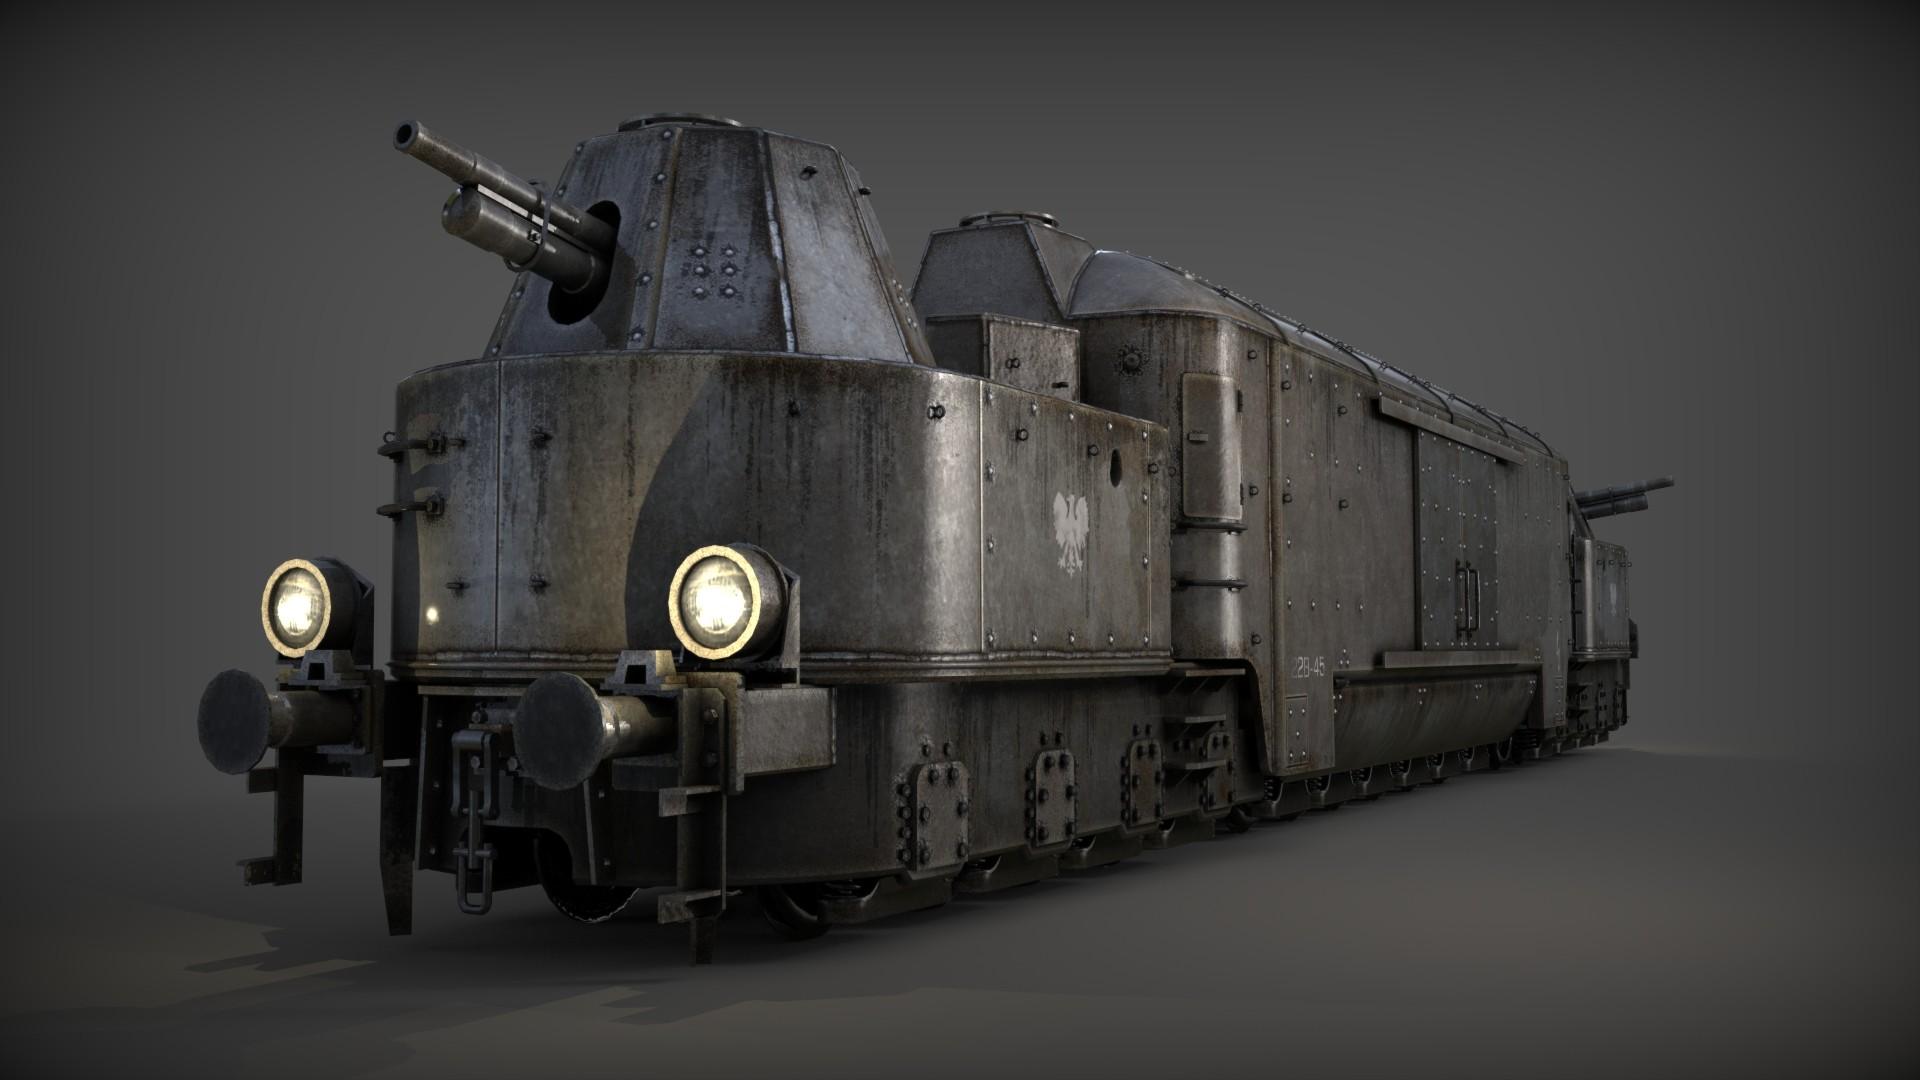 michal-bystrek-wagon-a4.jpg?1453797916